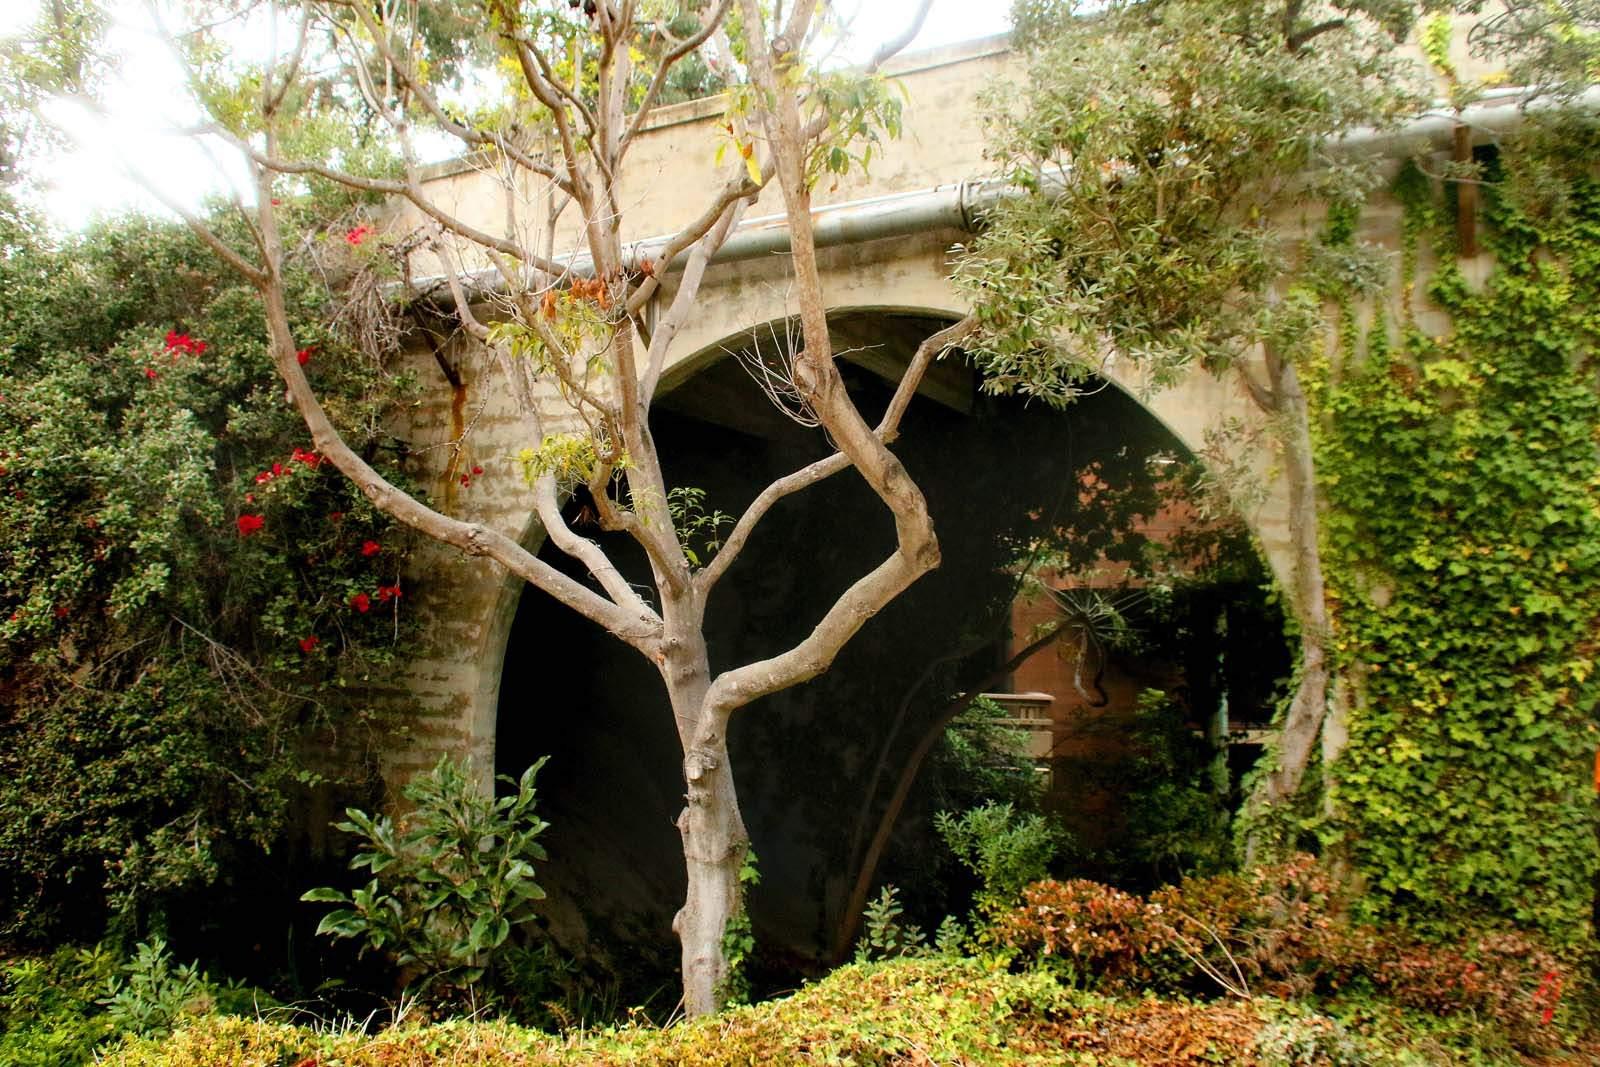 Visit one the Machado y Stewert Museum, one of San Diego's oldest pioneer homes located in Old Town